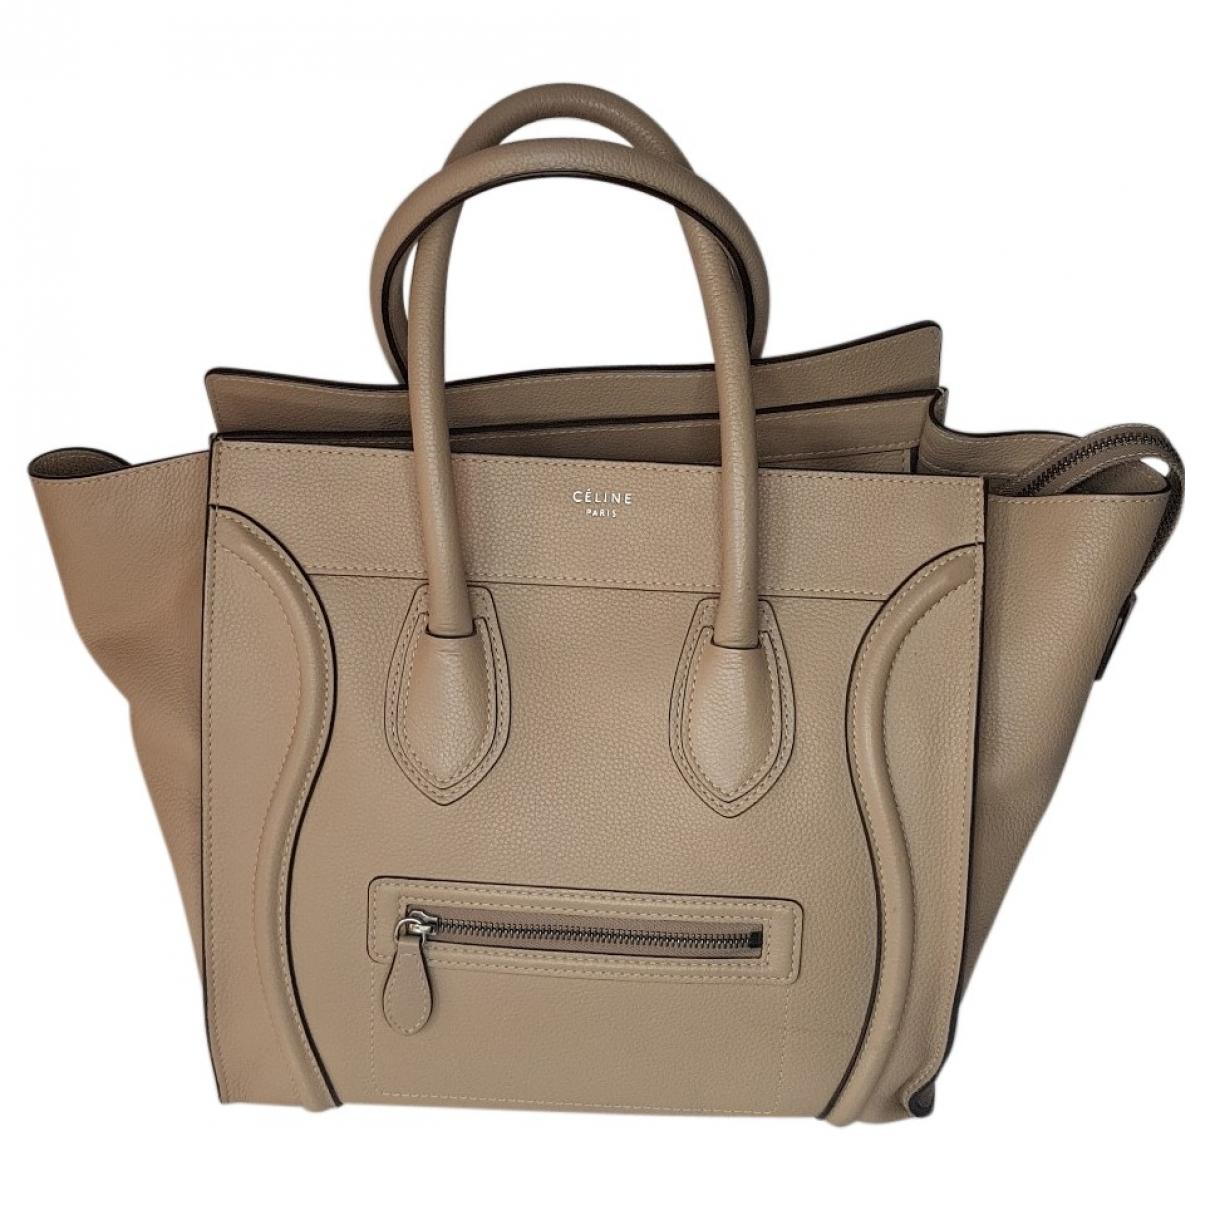 Celine Luggage Beige Leather handbag for Women N